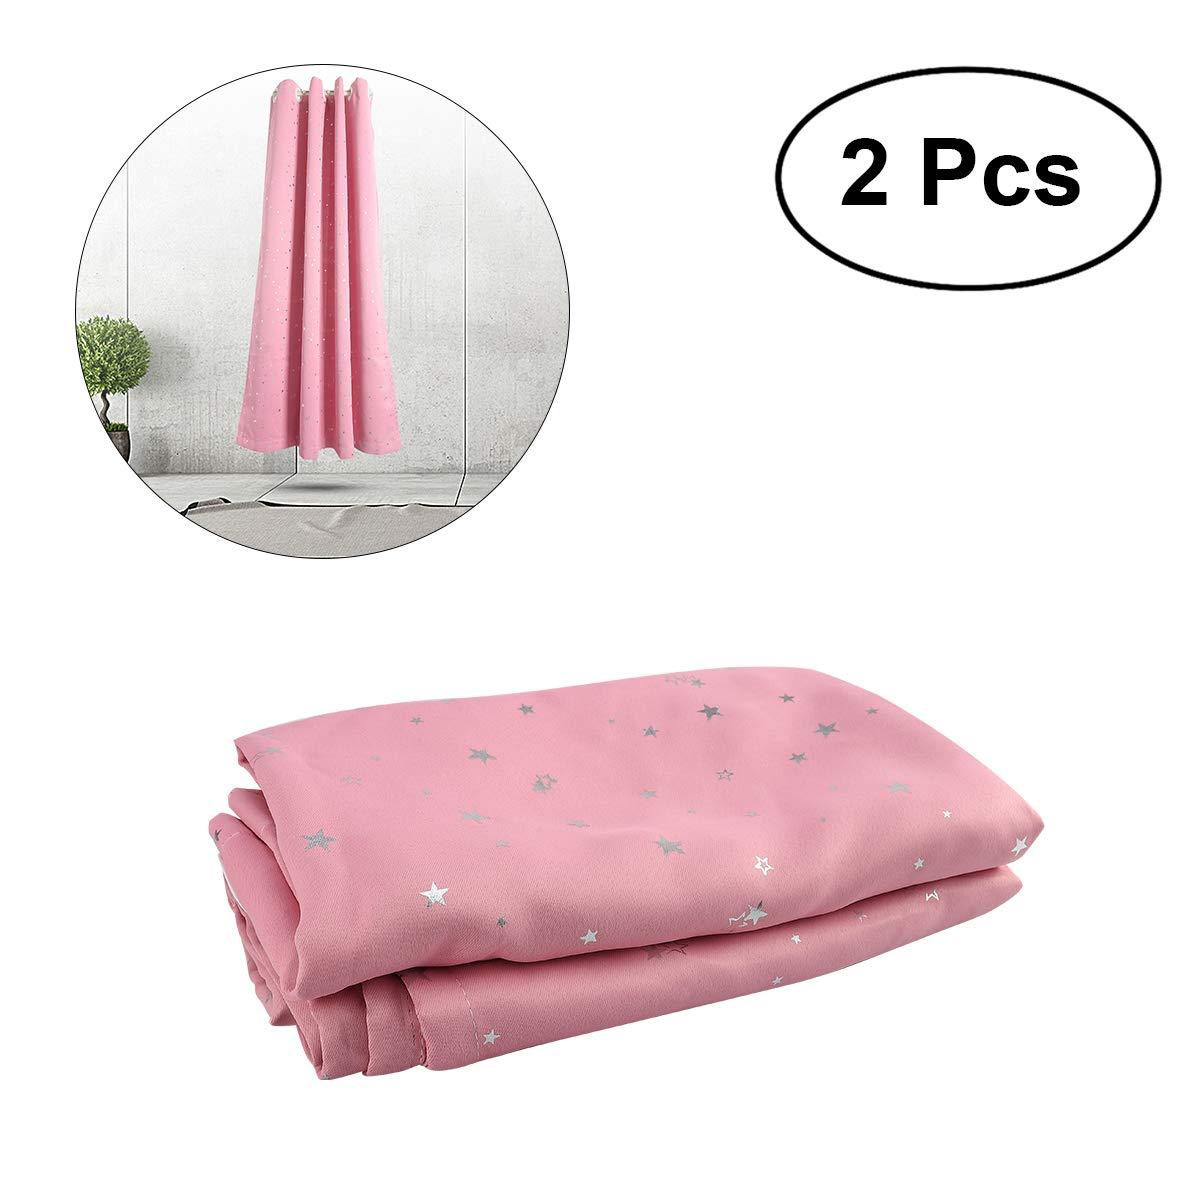 WINOMO Stelle Tende Stampa Tende Oscuranti Drapers Tende Termoisolanti 2pcs (Rosa)